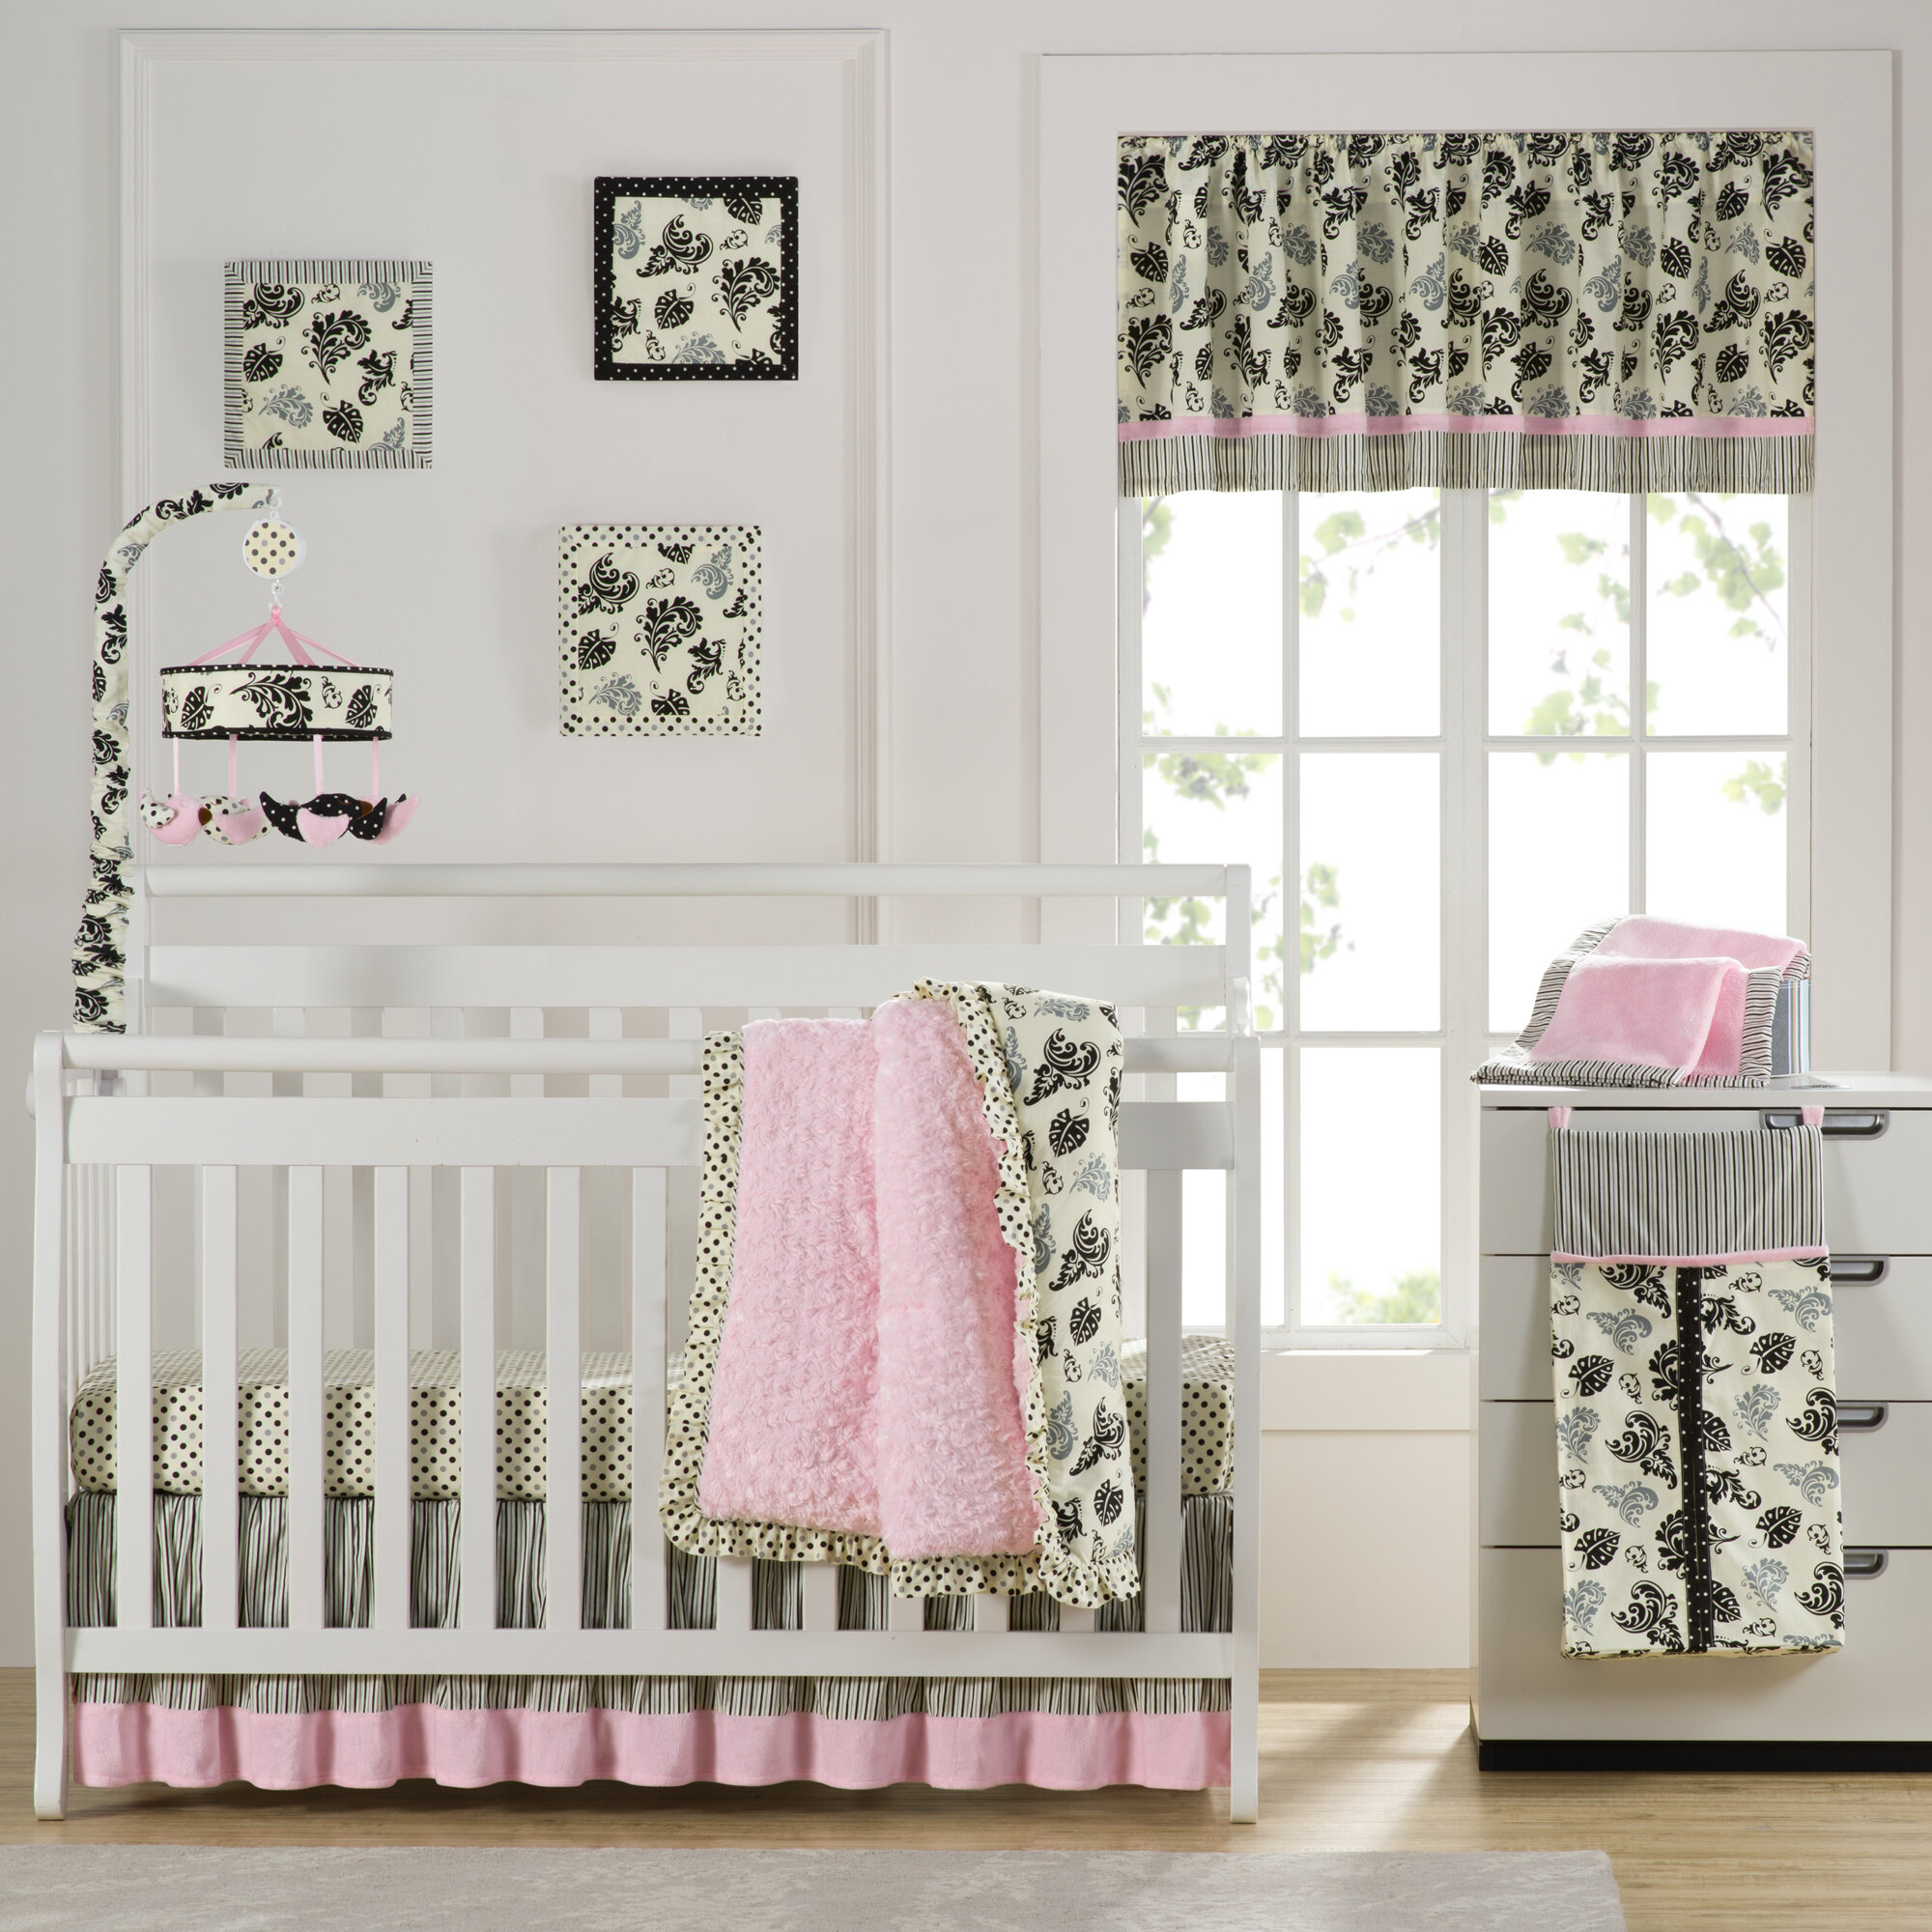 Laugh Giggle Smile Versailles Pink 10 Piece Crib Bedding Set Reviews Wayfair